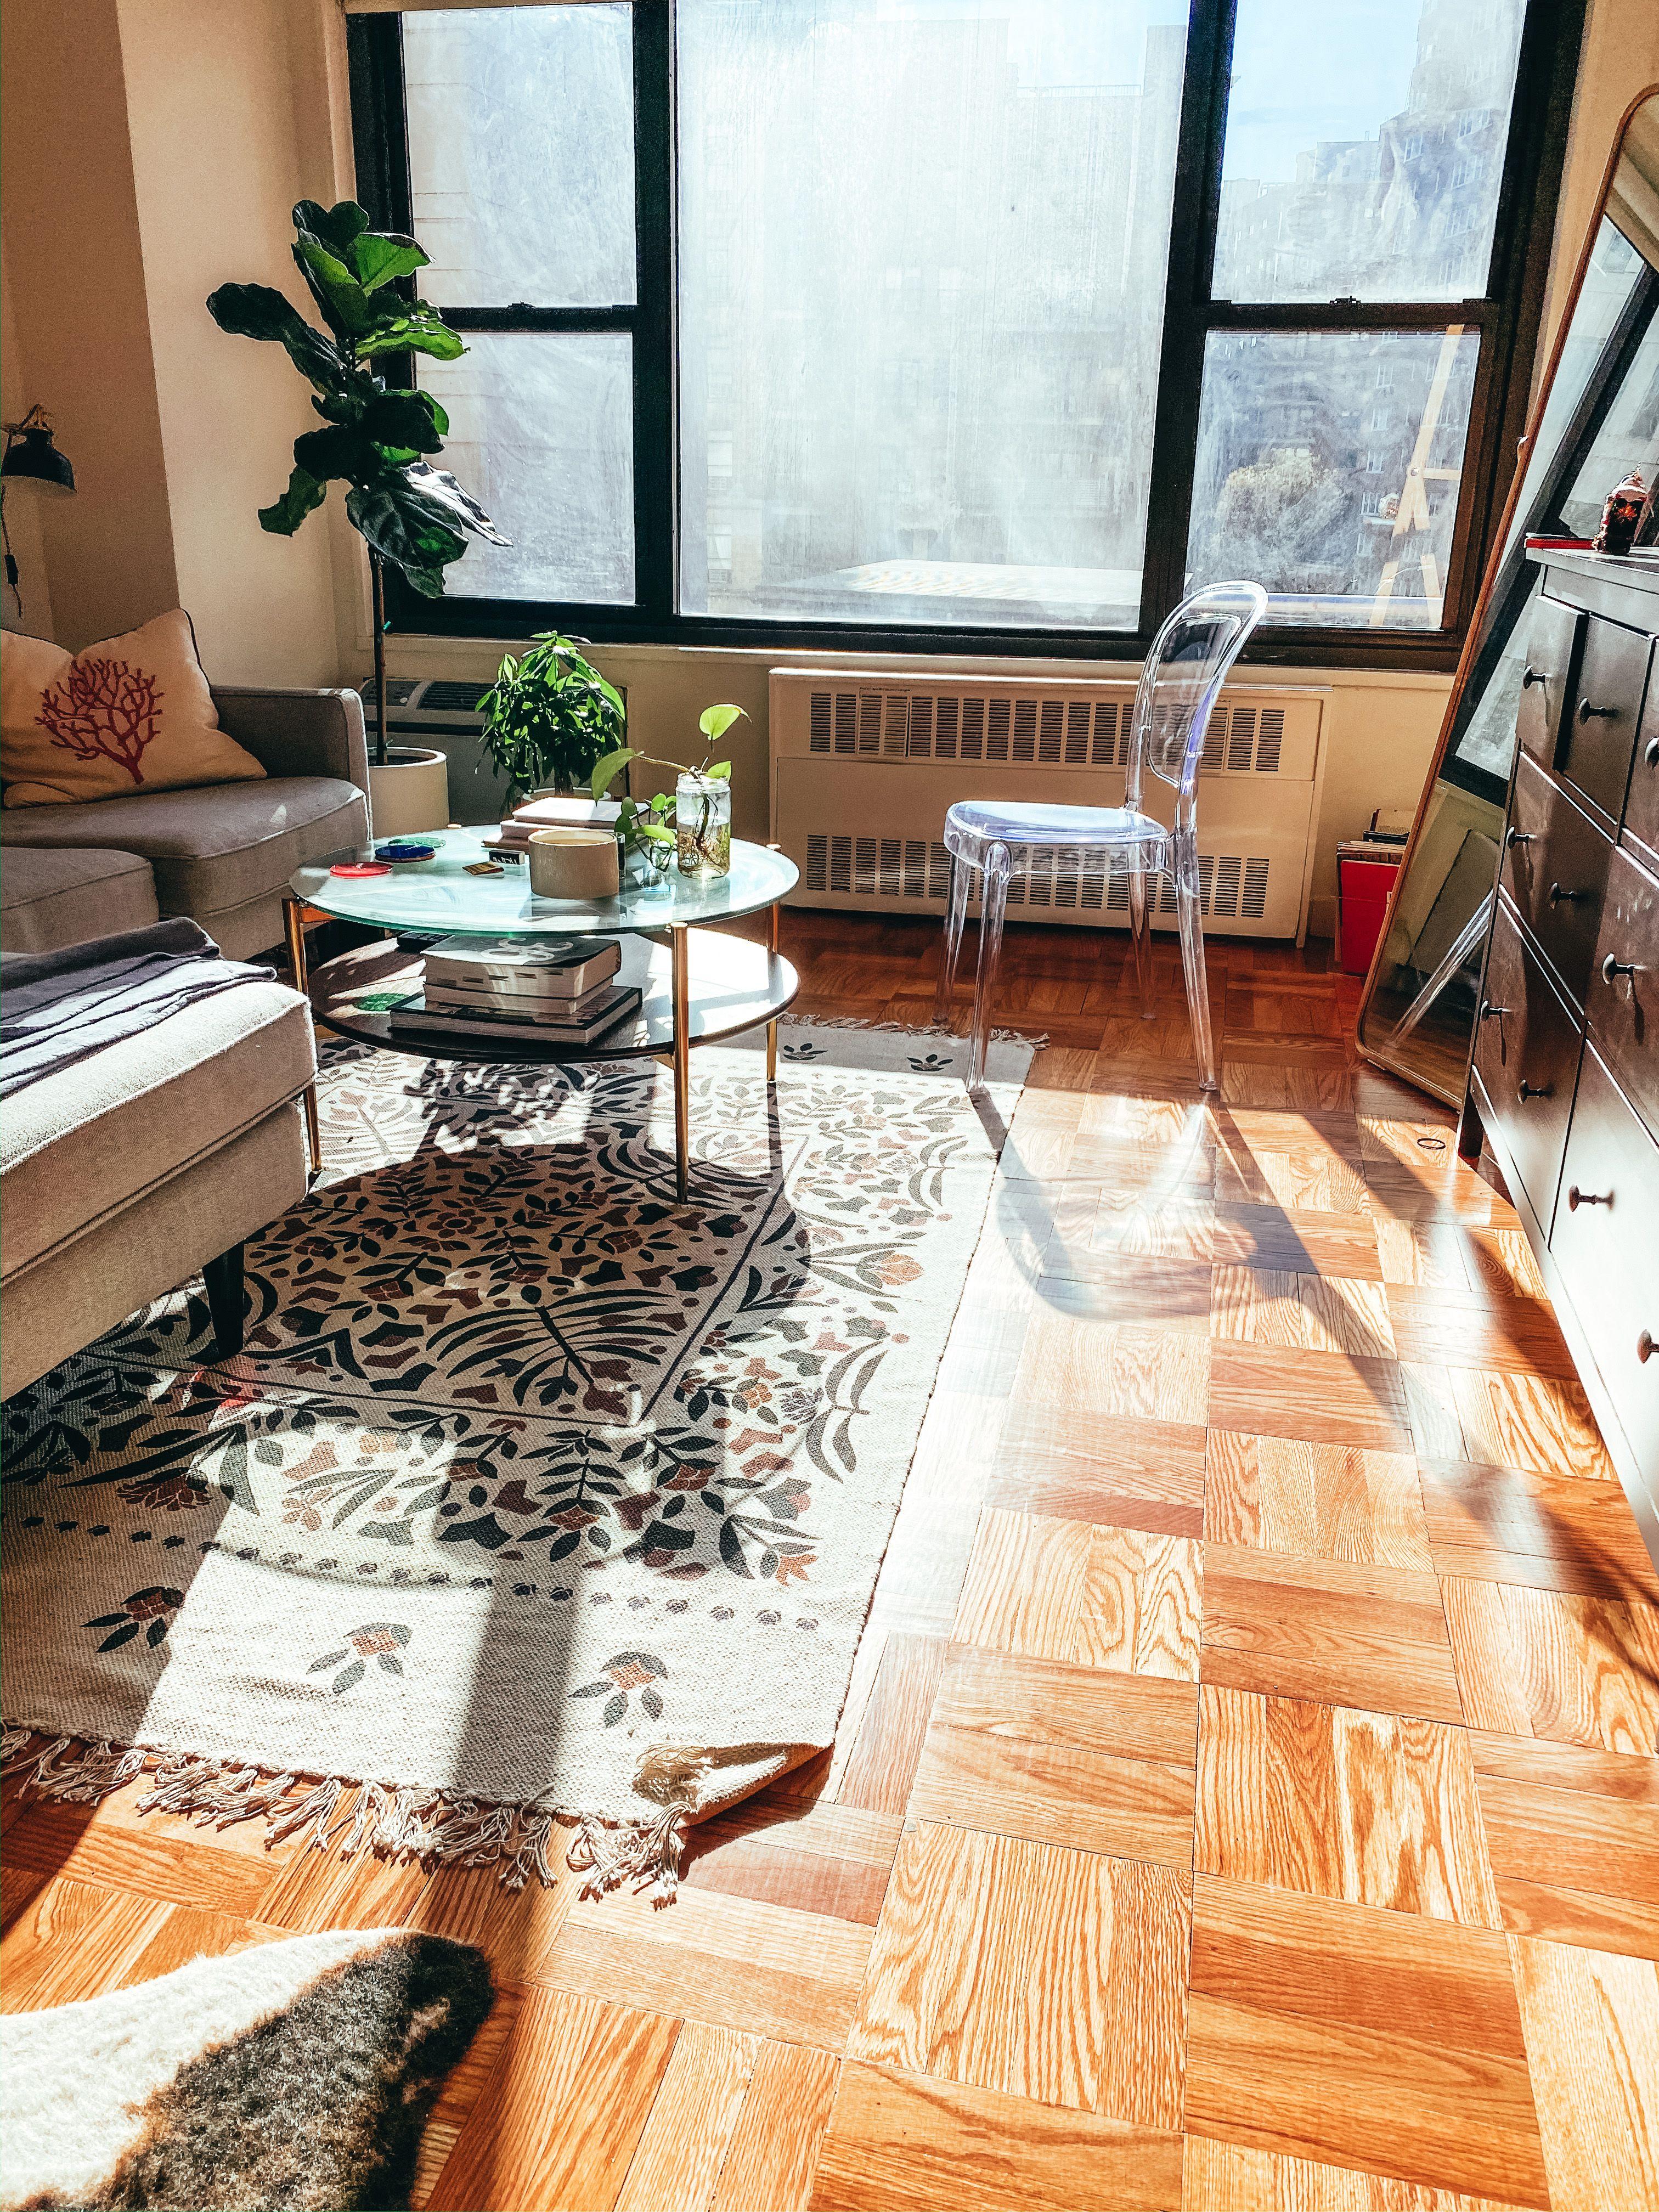 Sunny Day in 2020 Manhattan studio apartments, New york